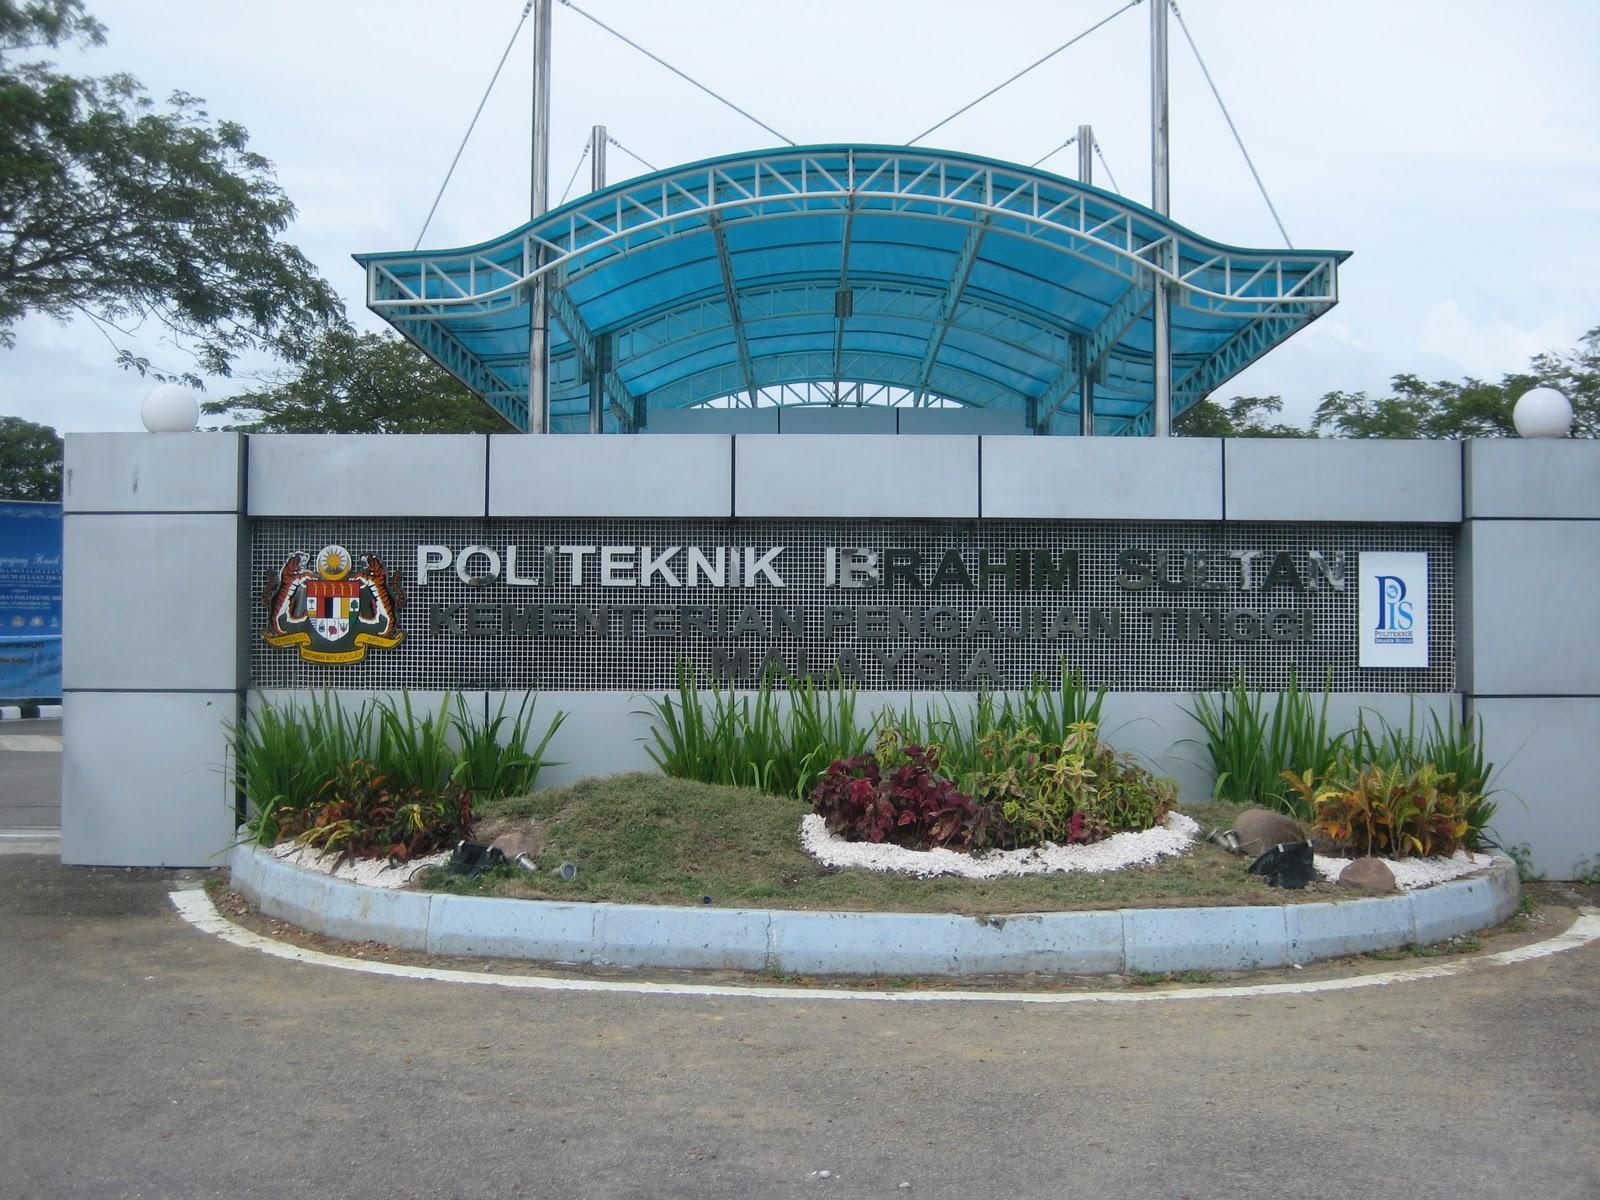 Penuntut politeknik diculik di Pasir Gudang berjaya lepaskan diri di Dungun